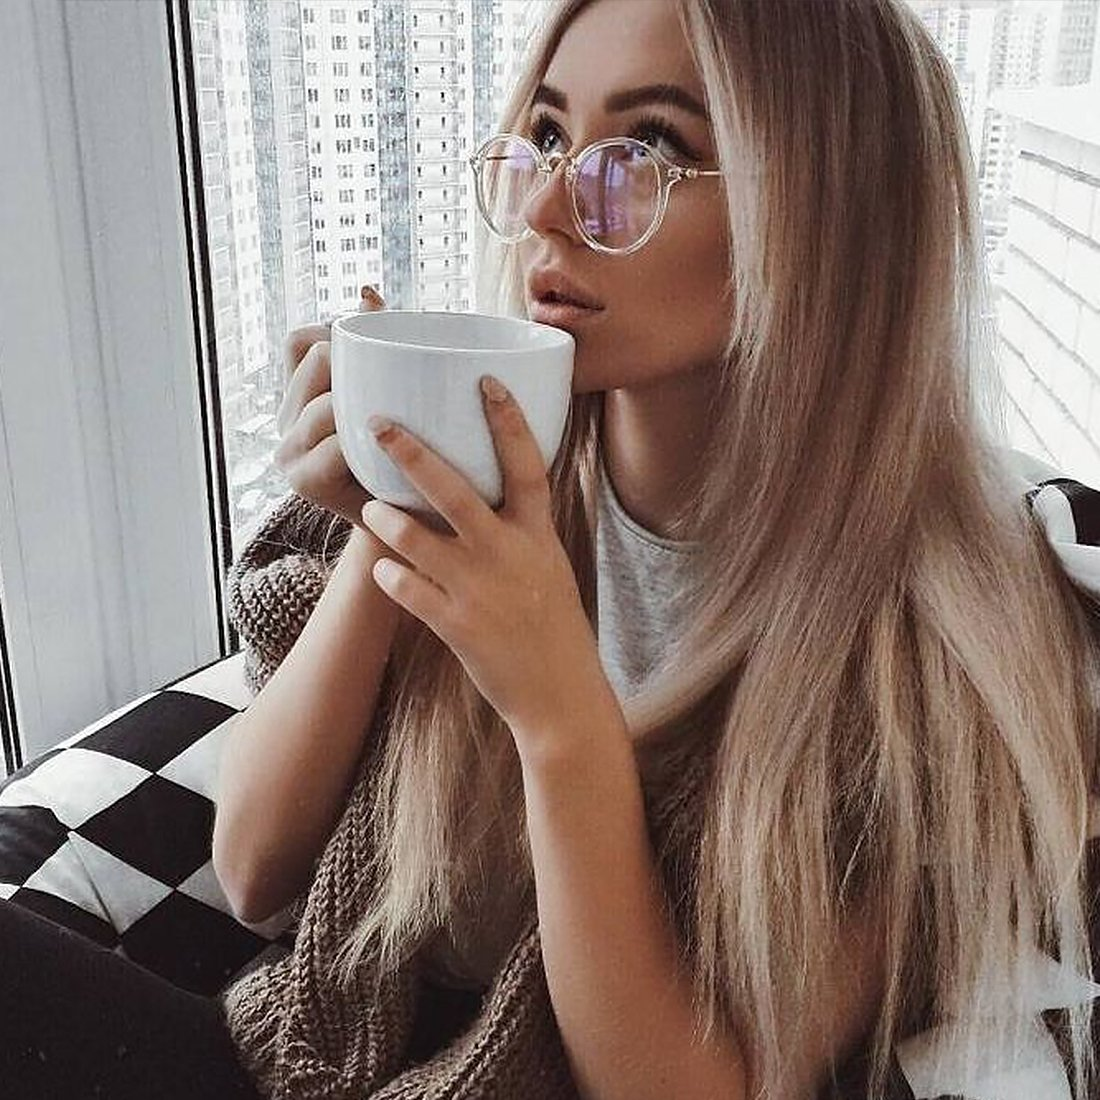 TIJN Vintage Round Prescription Eyewear Eyeglasses Frame with Clear Lenses for Women 3